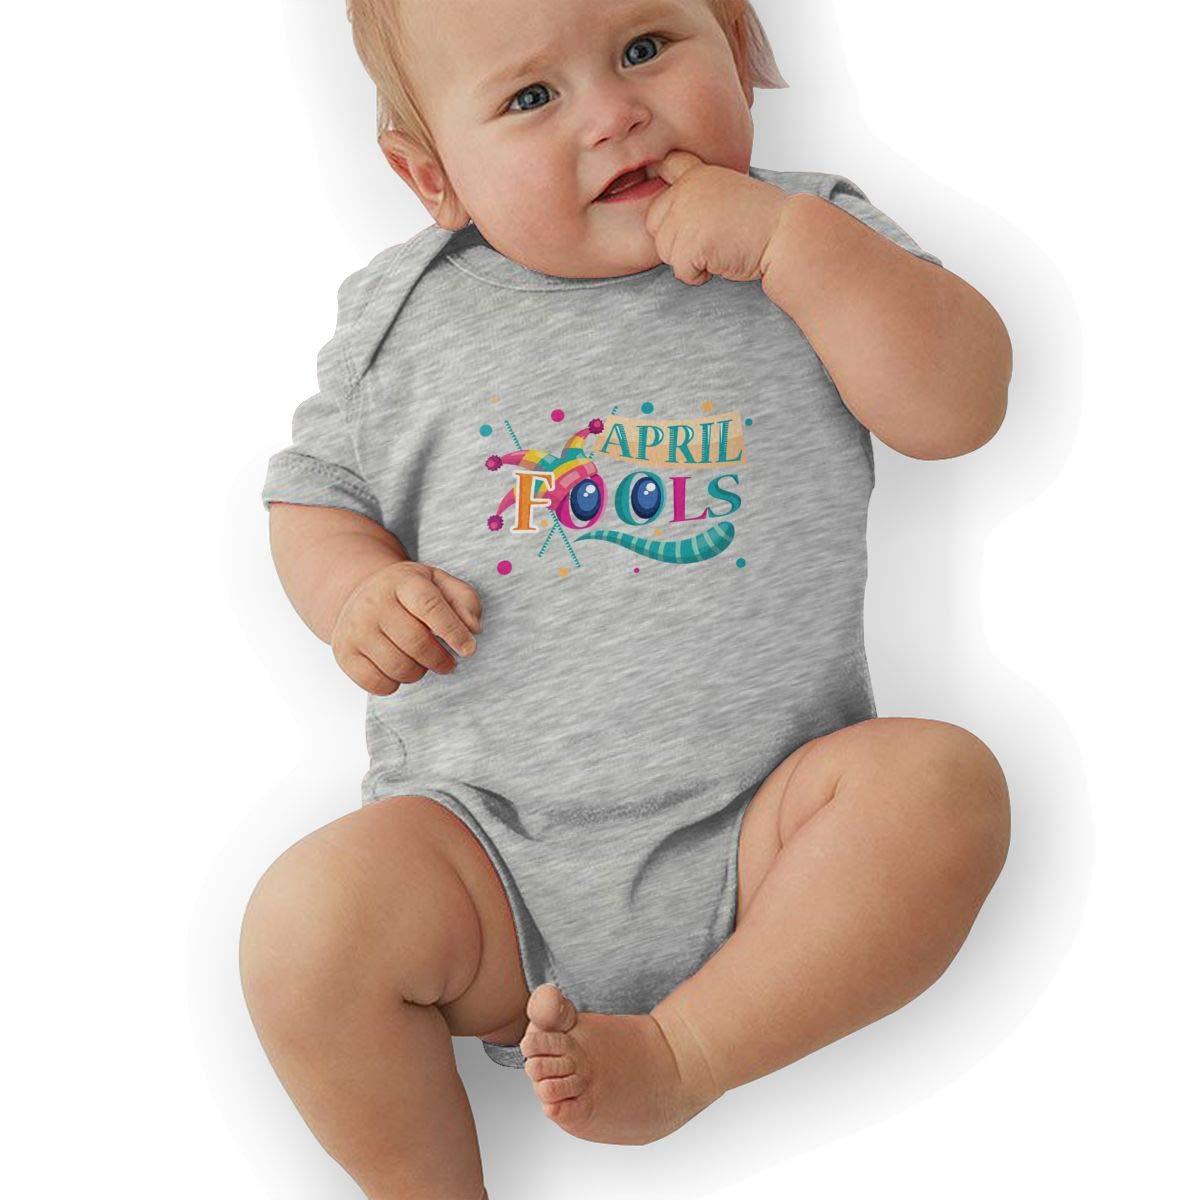 Toddler Baby Boys Bodysuit Short-Sleeve Onesie Funny Fools Day Full Print Rompers Summer Pajamas